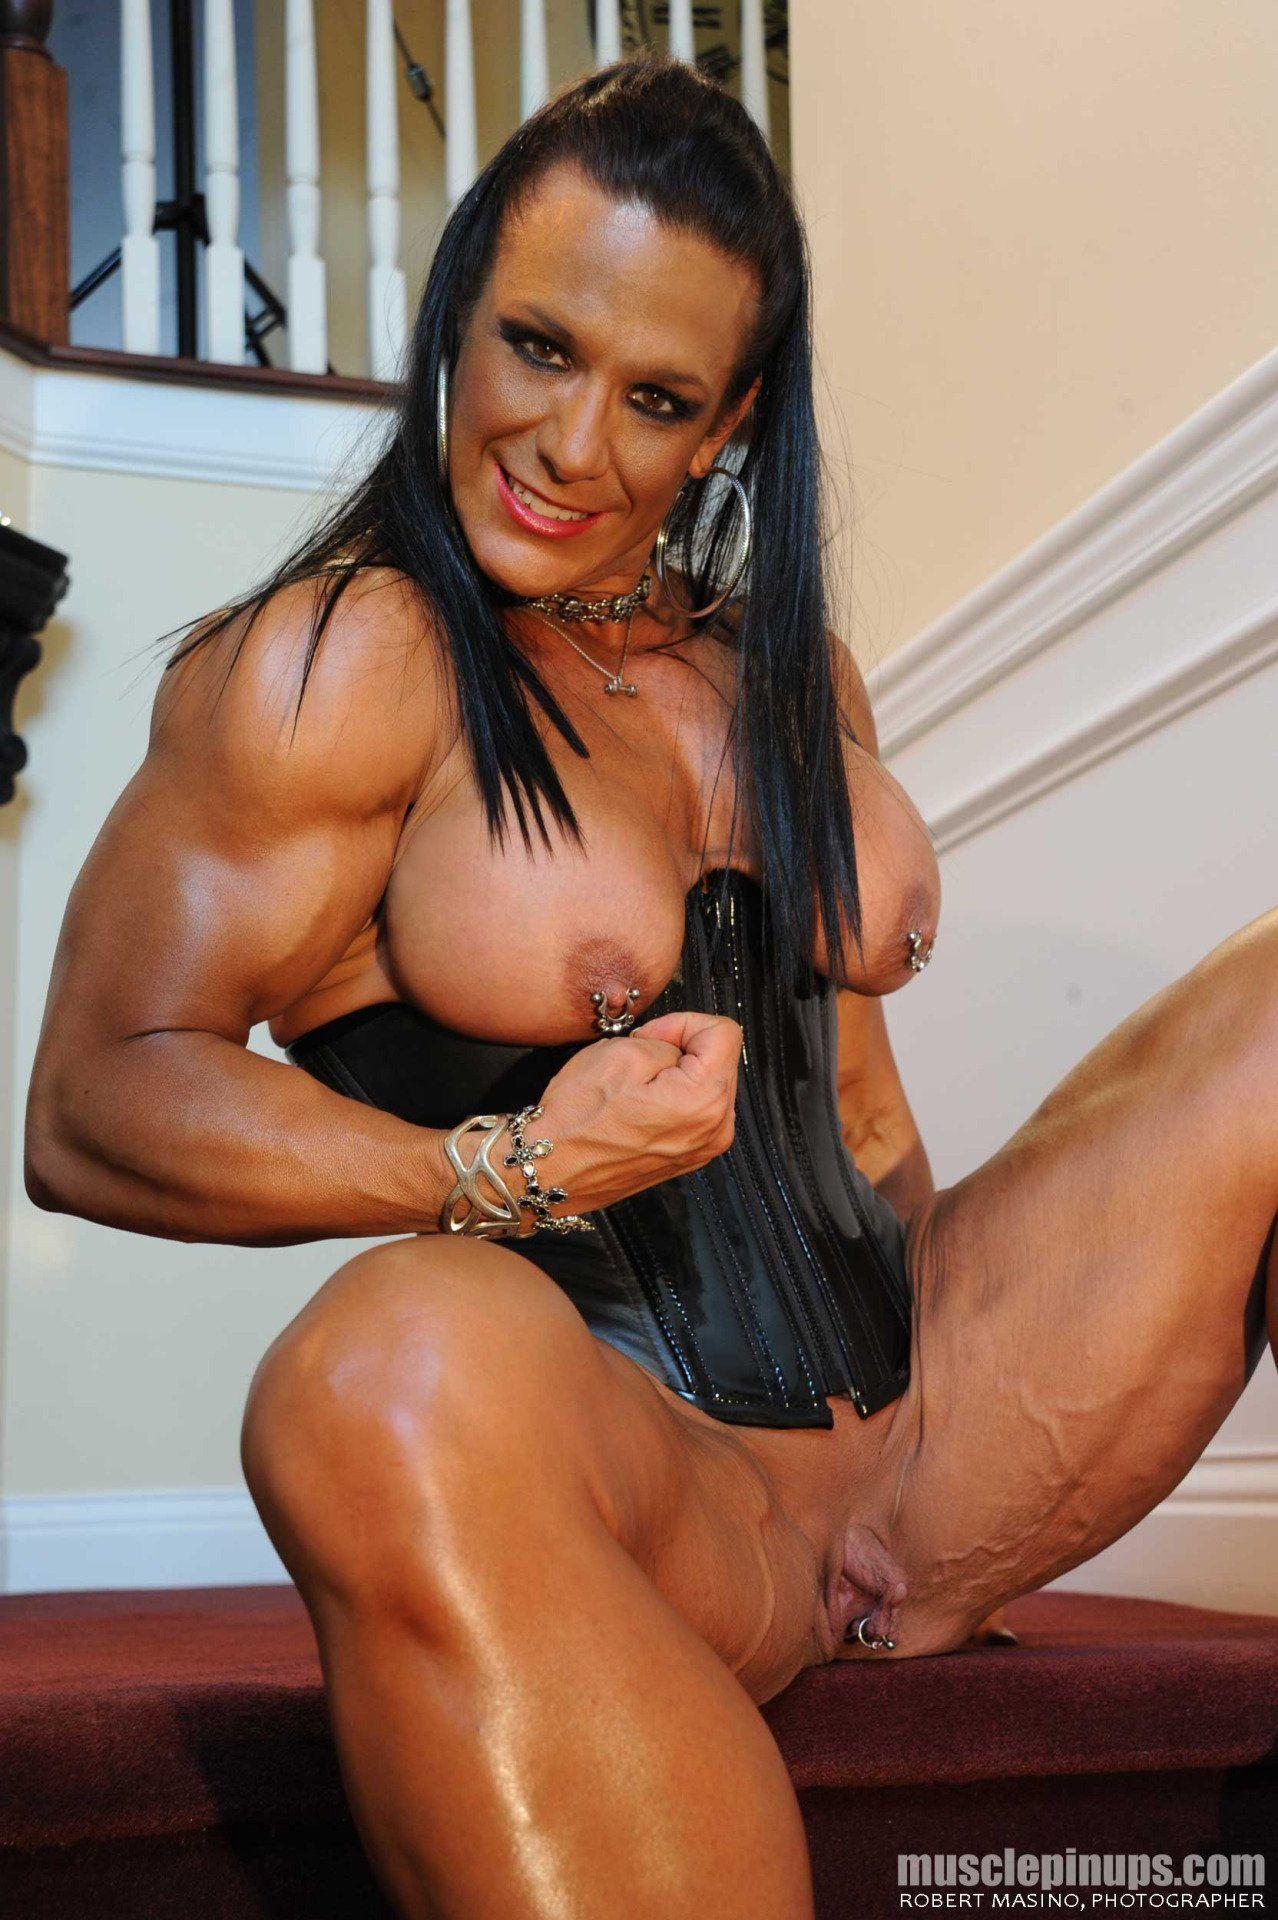 Asian Female Bodybuilder Porn nude female bodybuilding large clitoris - xxx pics.